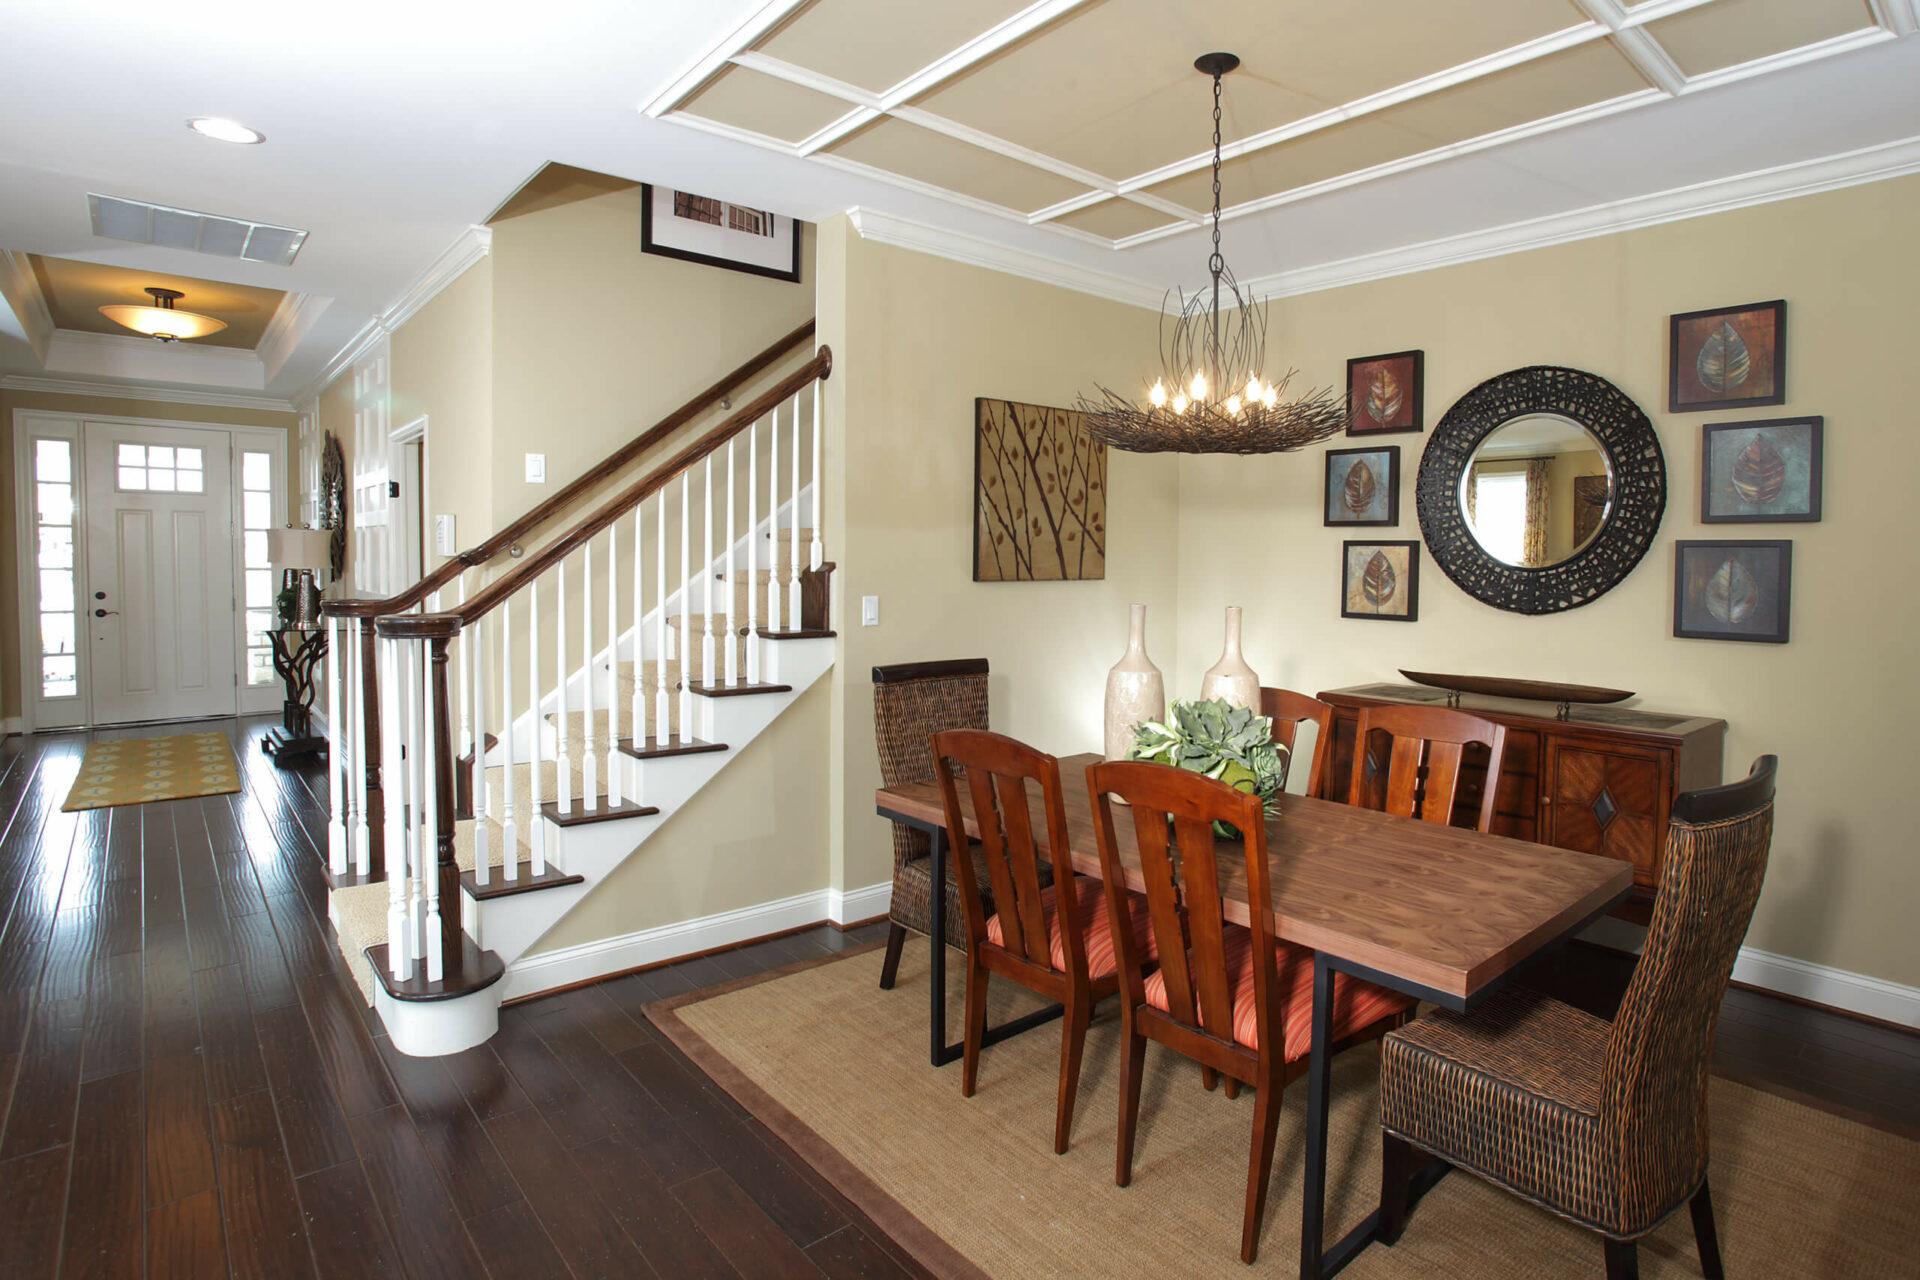 The Washington Designer Model 55+ Community Home in Lititz, PA